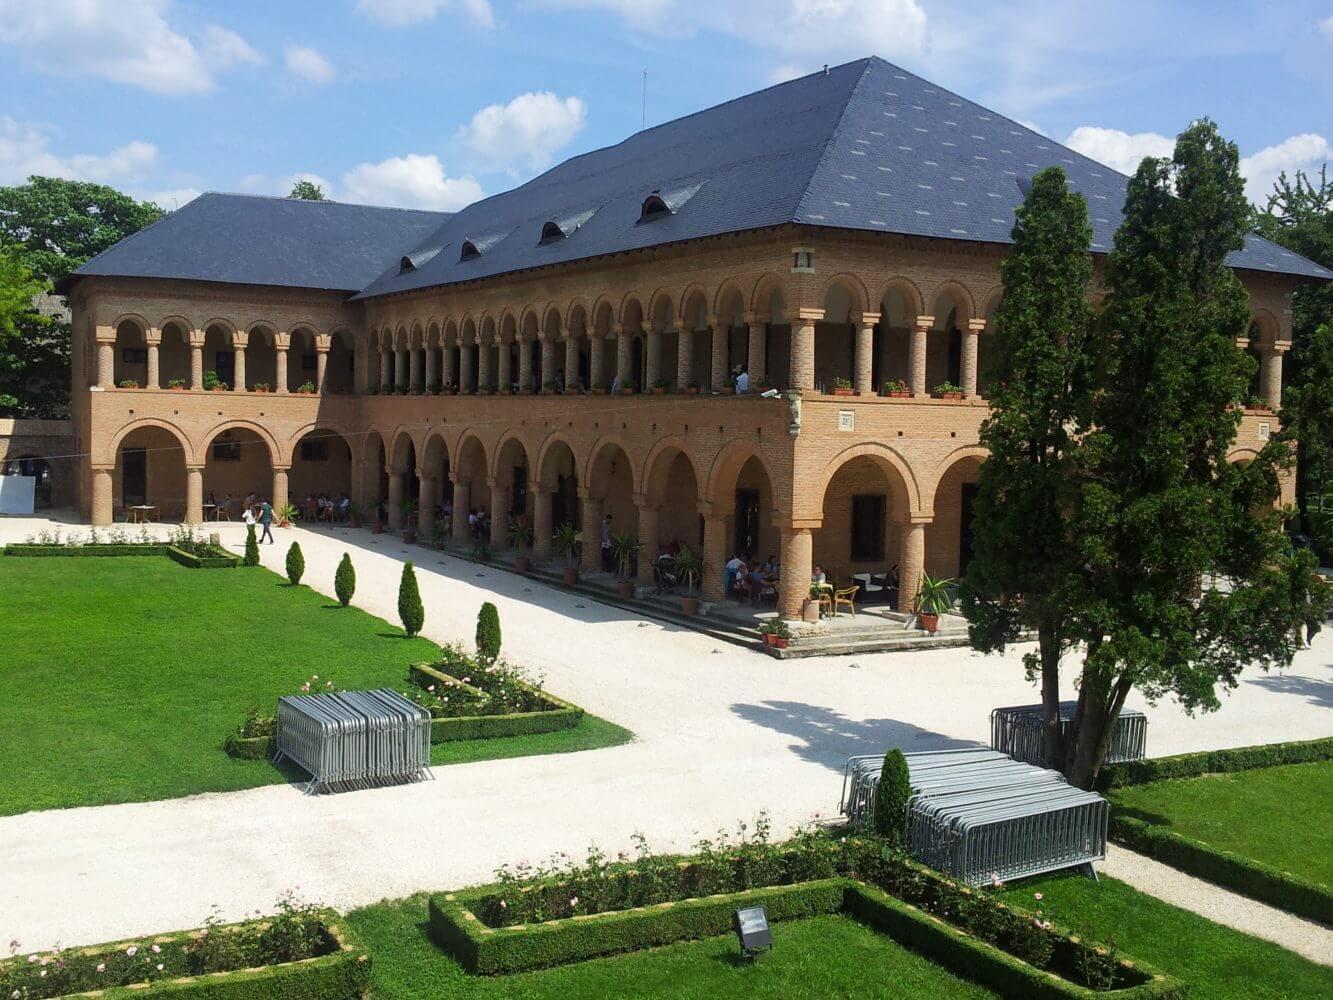 Palatele României – Palatul Mogoşoaia